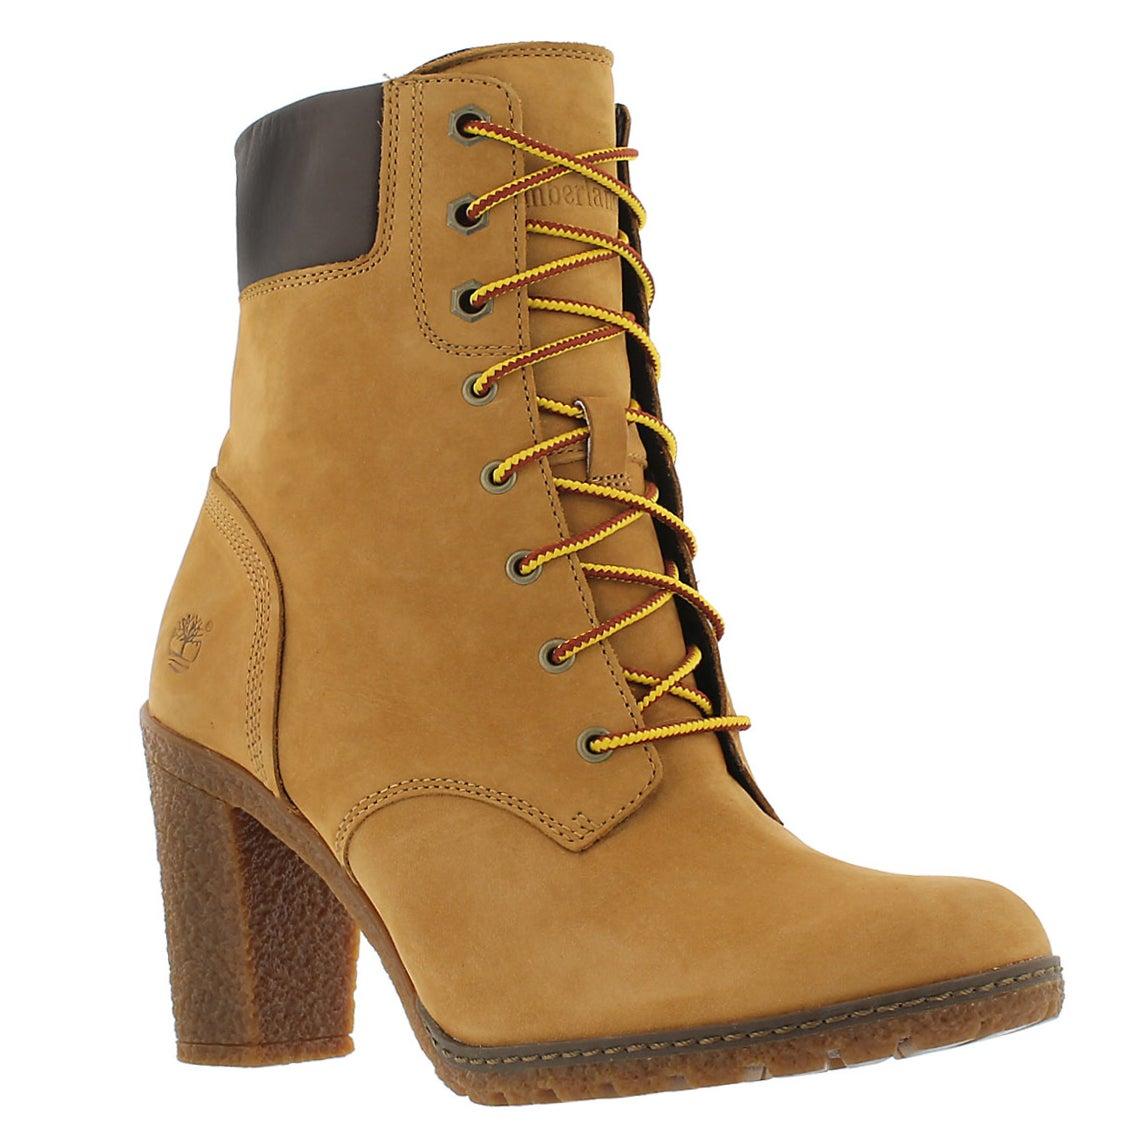 Women's GLANCY laced wheat nubuck boots